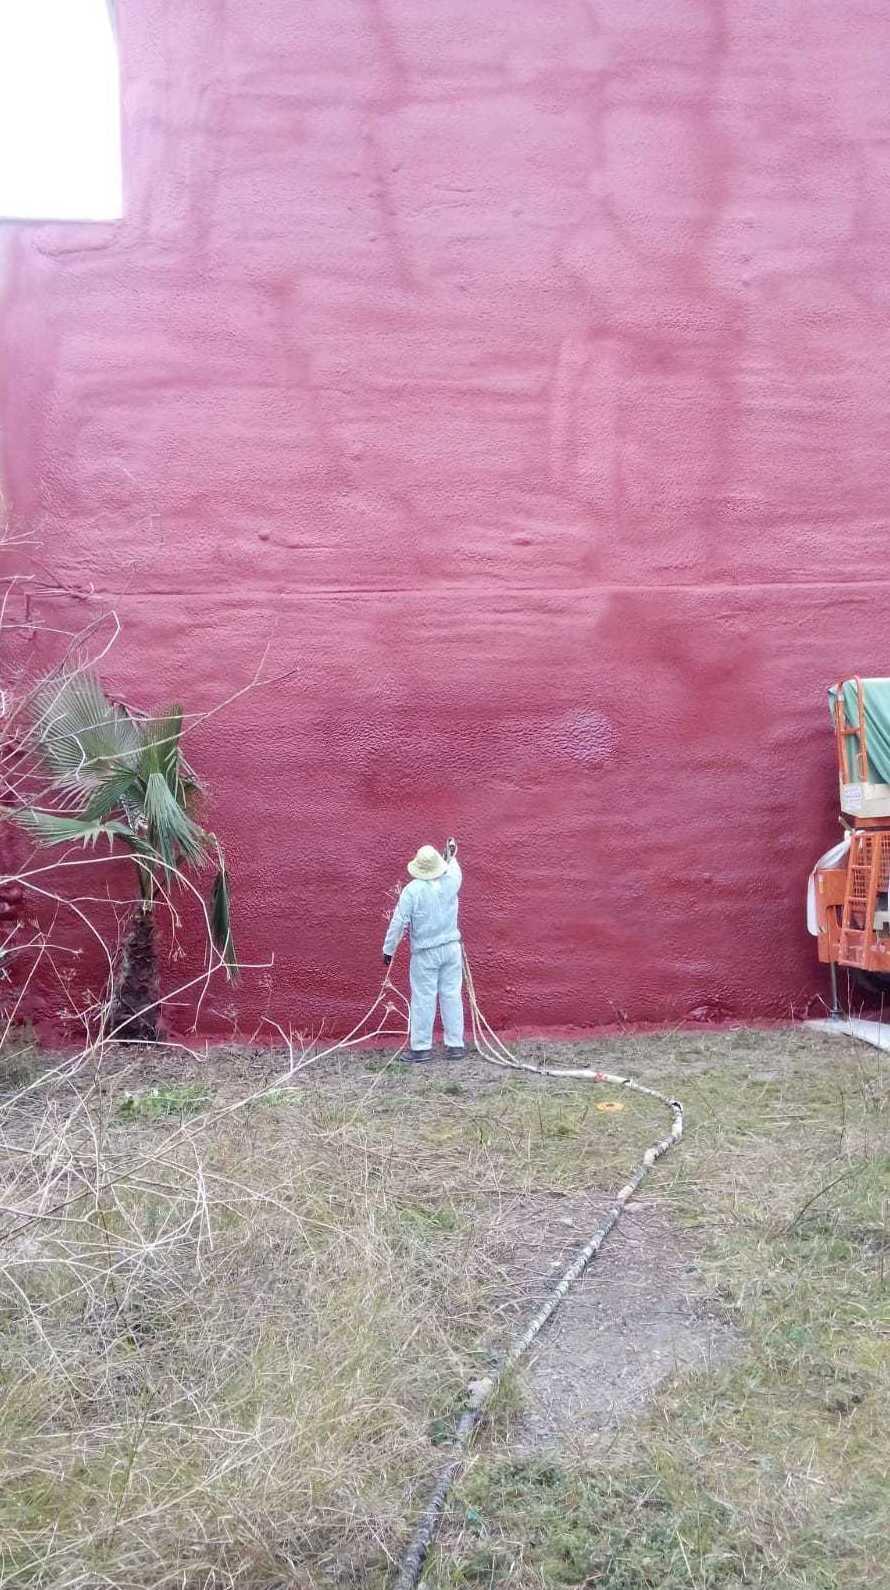 Foto 1 de Aislamientos acústicos y térmicos en Rafelcofer | Aislamientos de Poliuretano Jaime Femenia